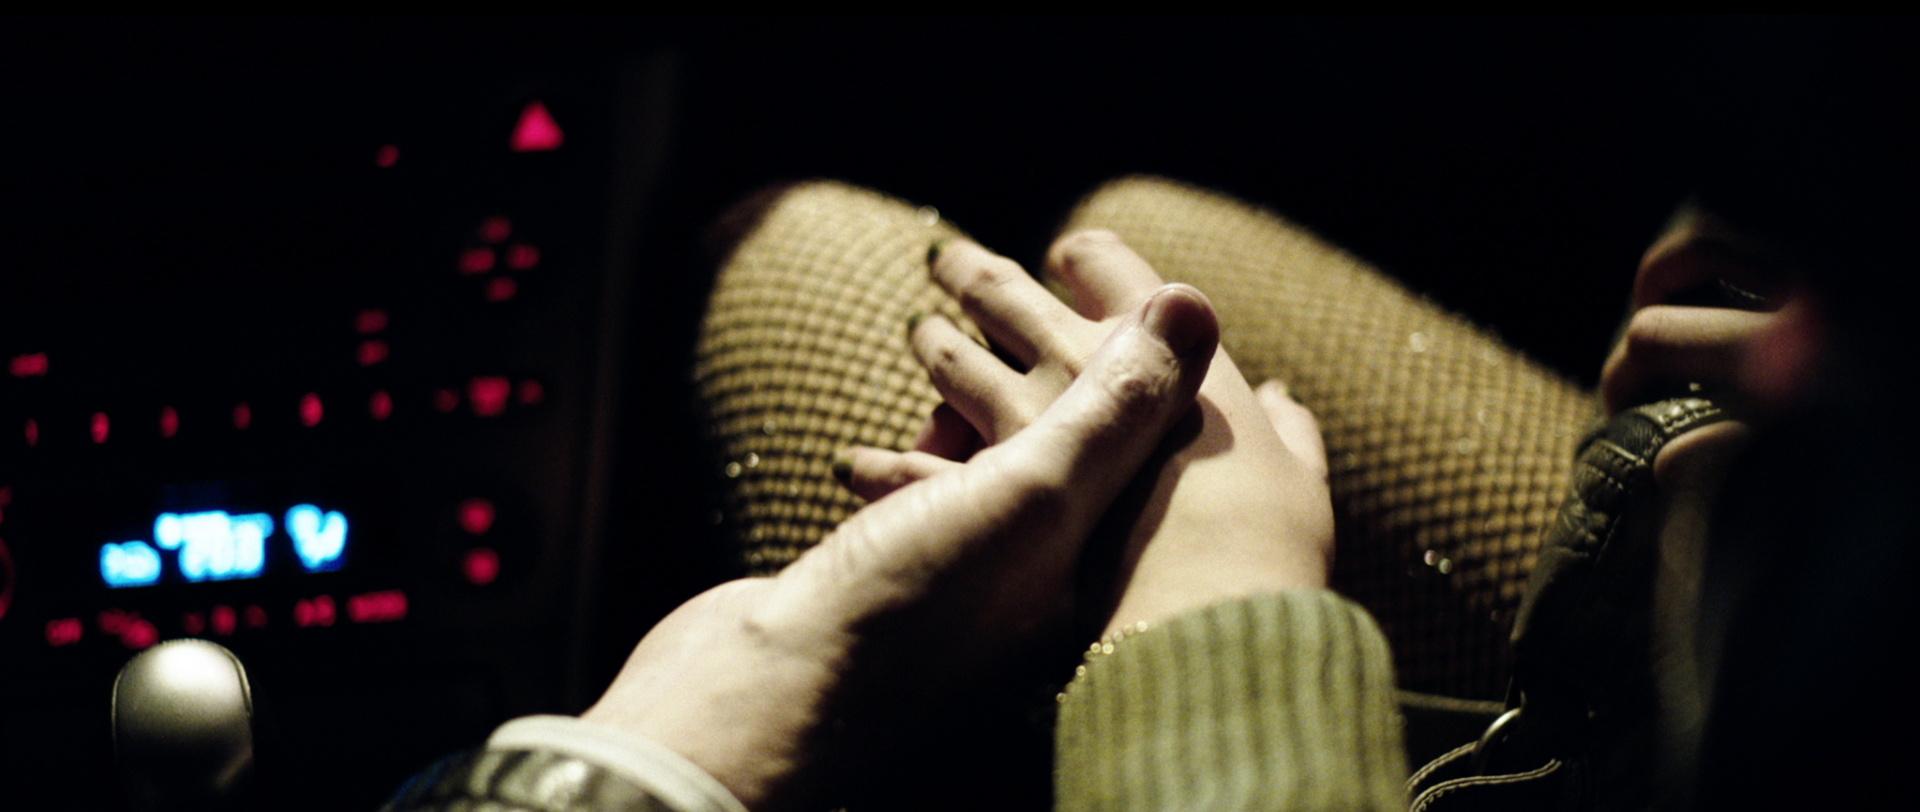 Traumland - Dreamland - Mia (Luna Mijovic) mit Netzstrumpfhose im Auto eines Freiers - Regie Petra Volpe - Kamera Judith Kaufmann